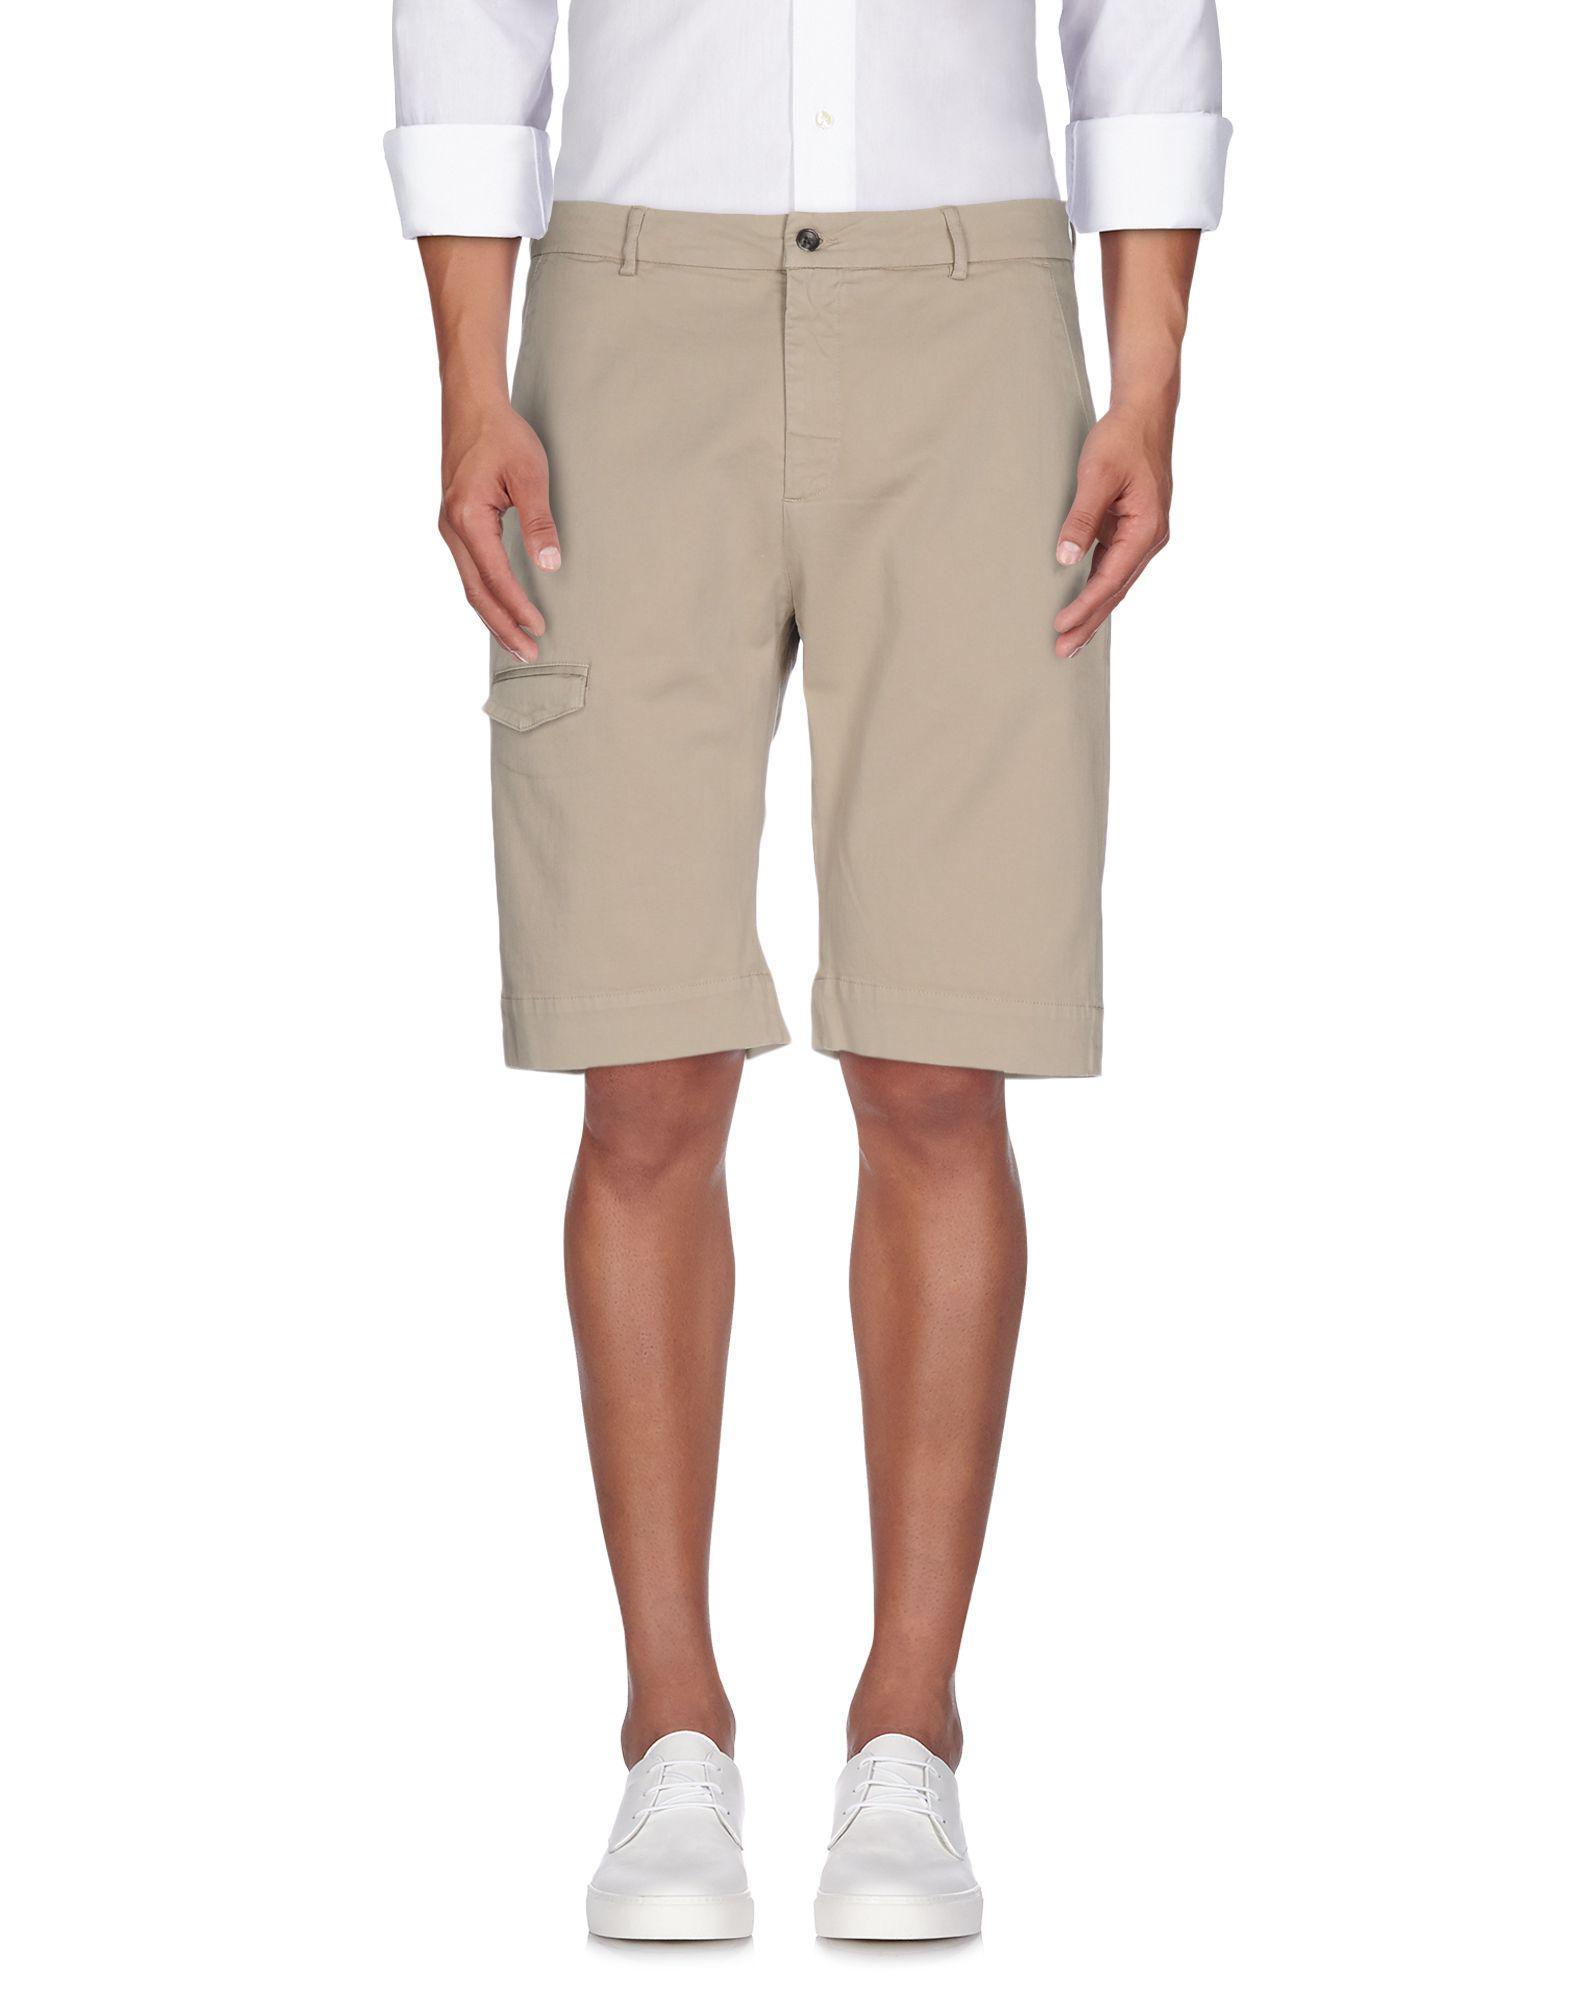 Pantalon - Bermuda Faible Marque mnXOAu6